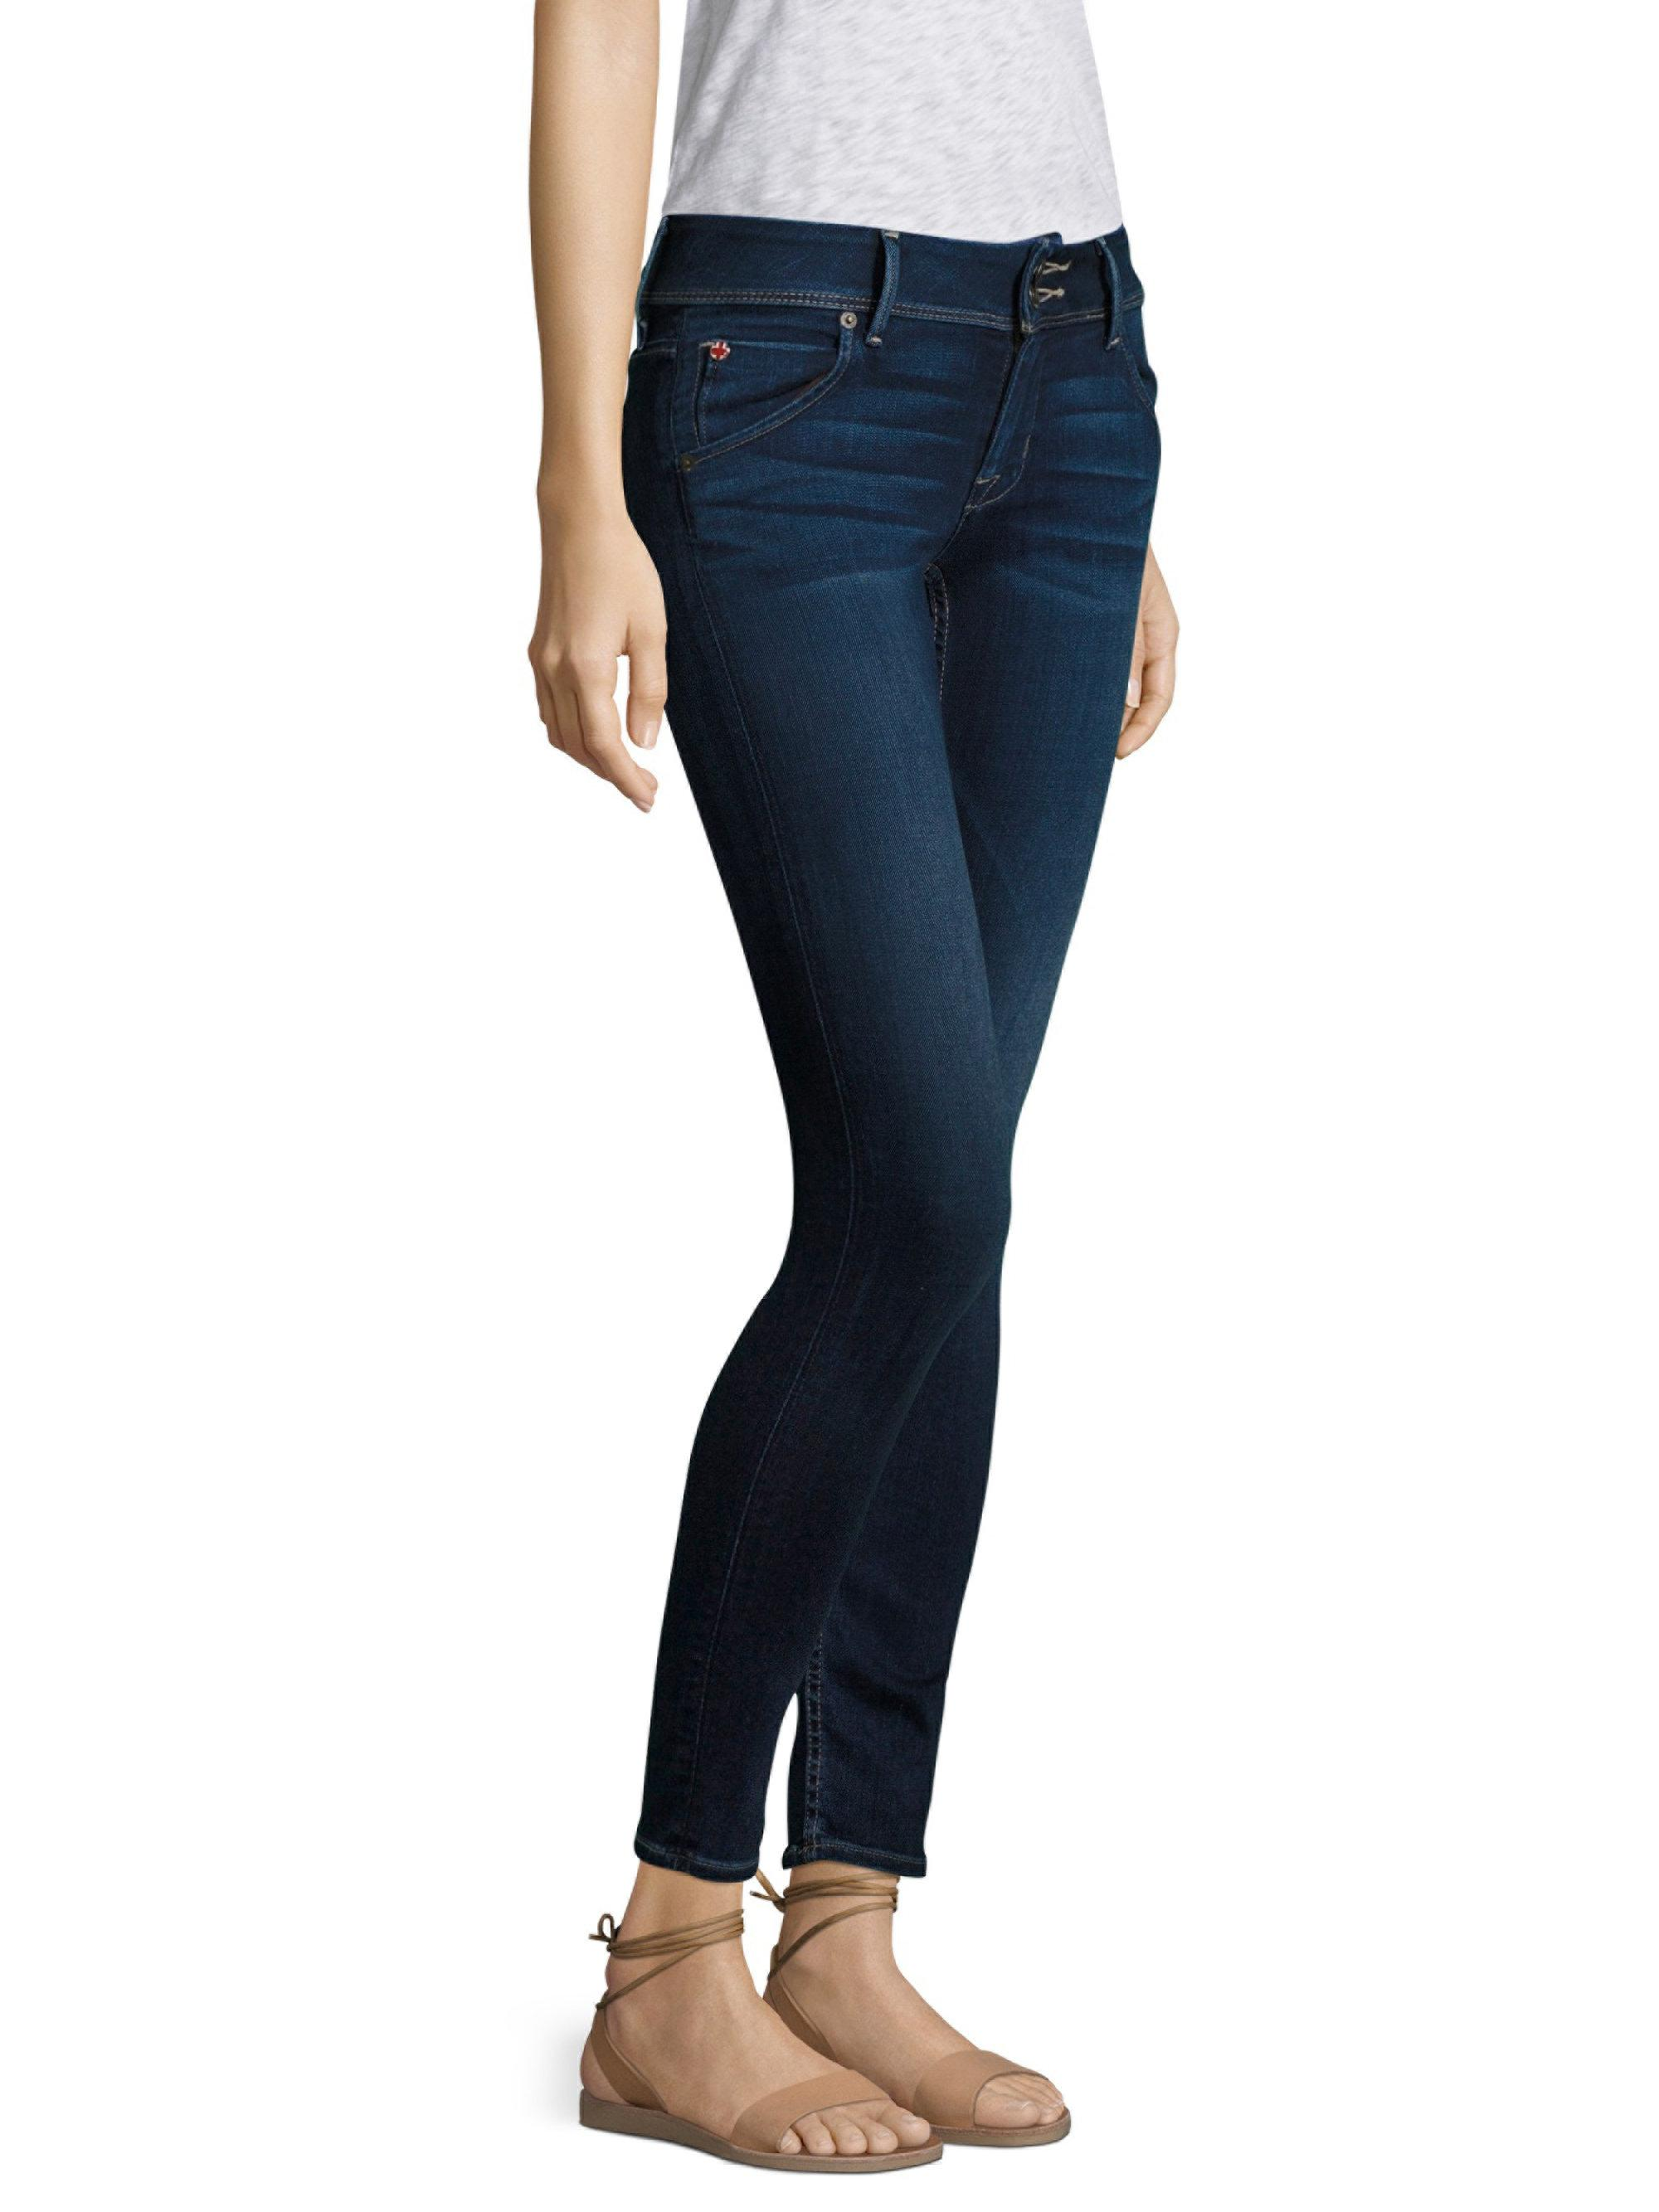 Hudson Womens Tall Collin Supermodel-Length Skinny Jean In Black